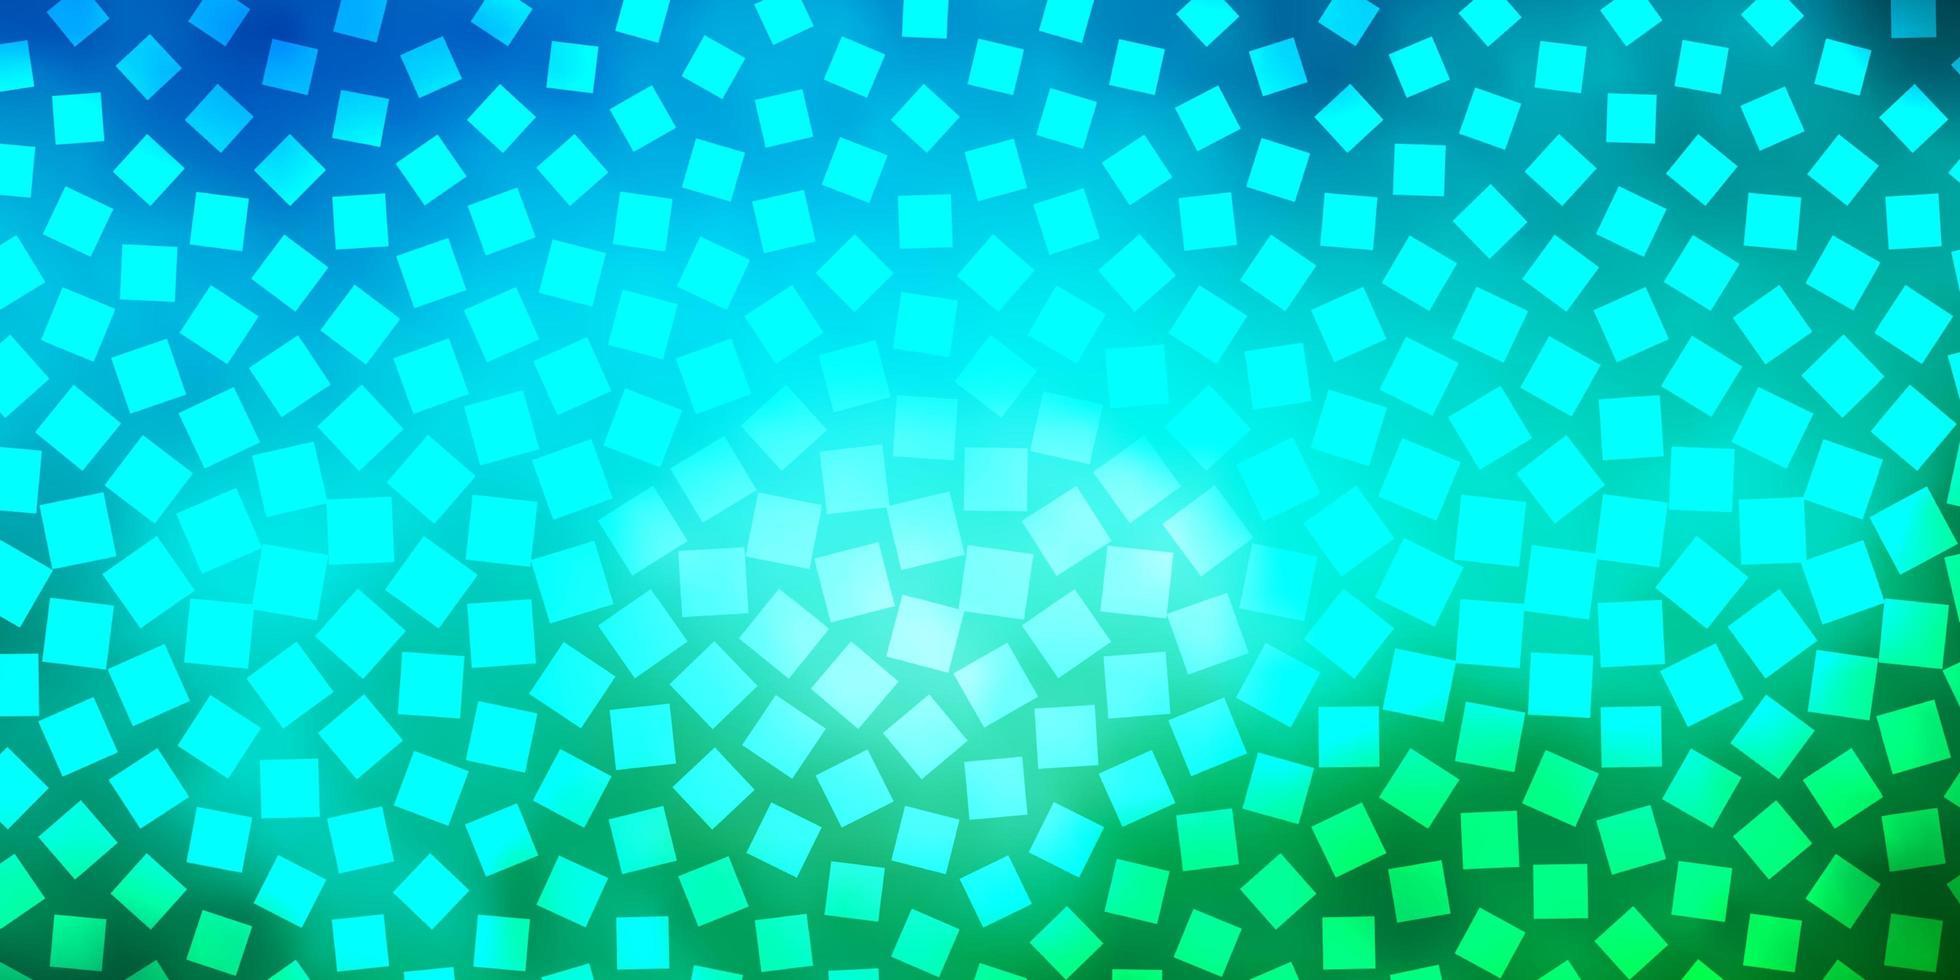 fond de vecteur bleu clair, vert dans un style polygonal.